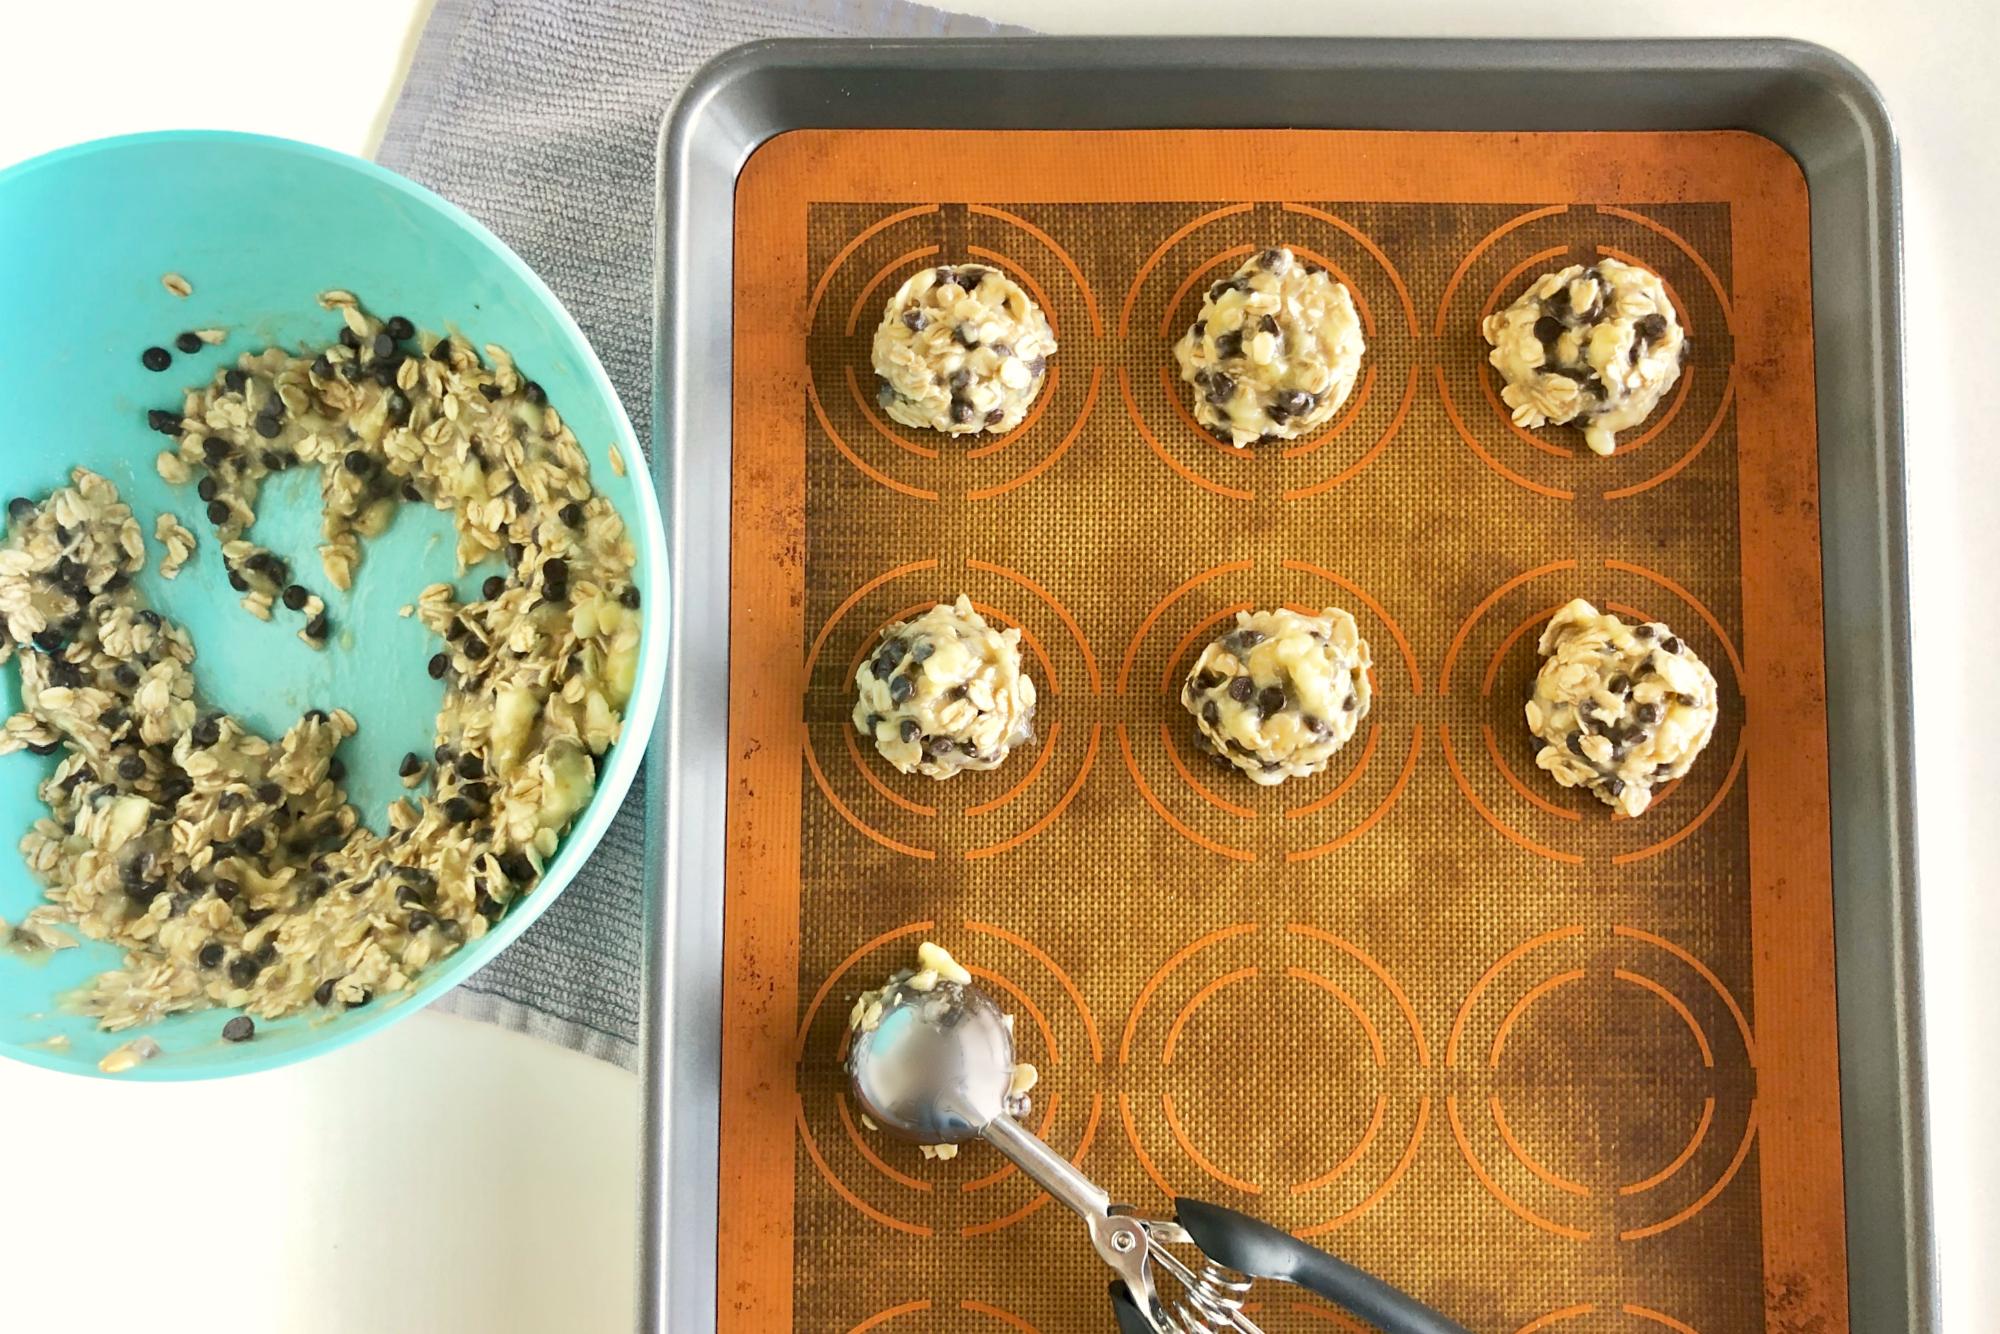 Baking 3 Ingredient Banana Oat Chocolate Chip Cookies